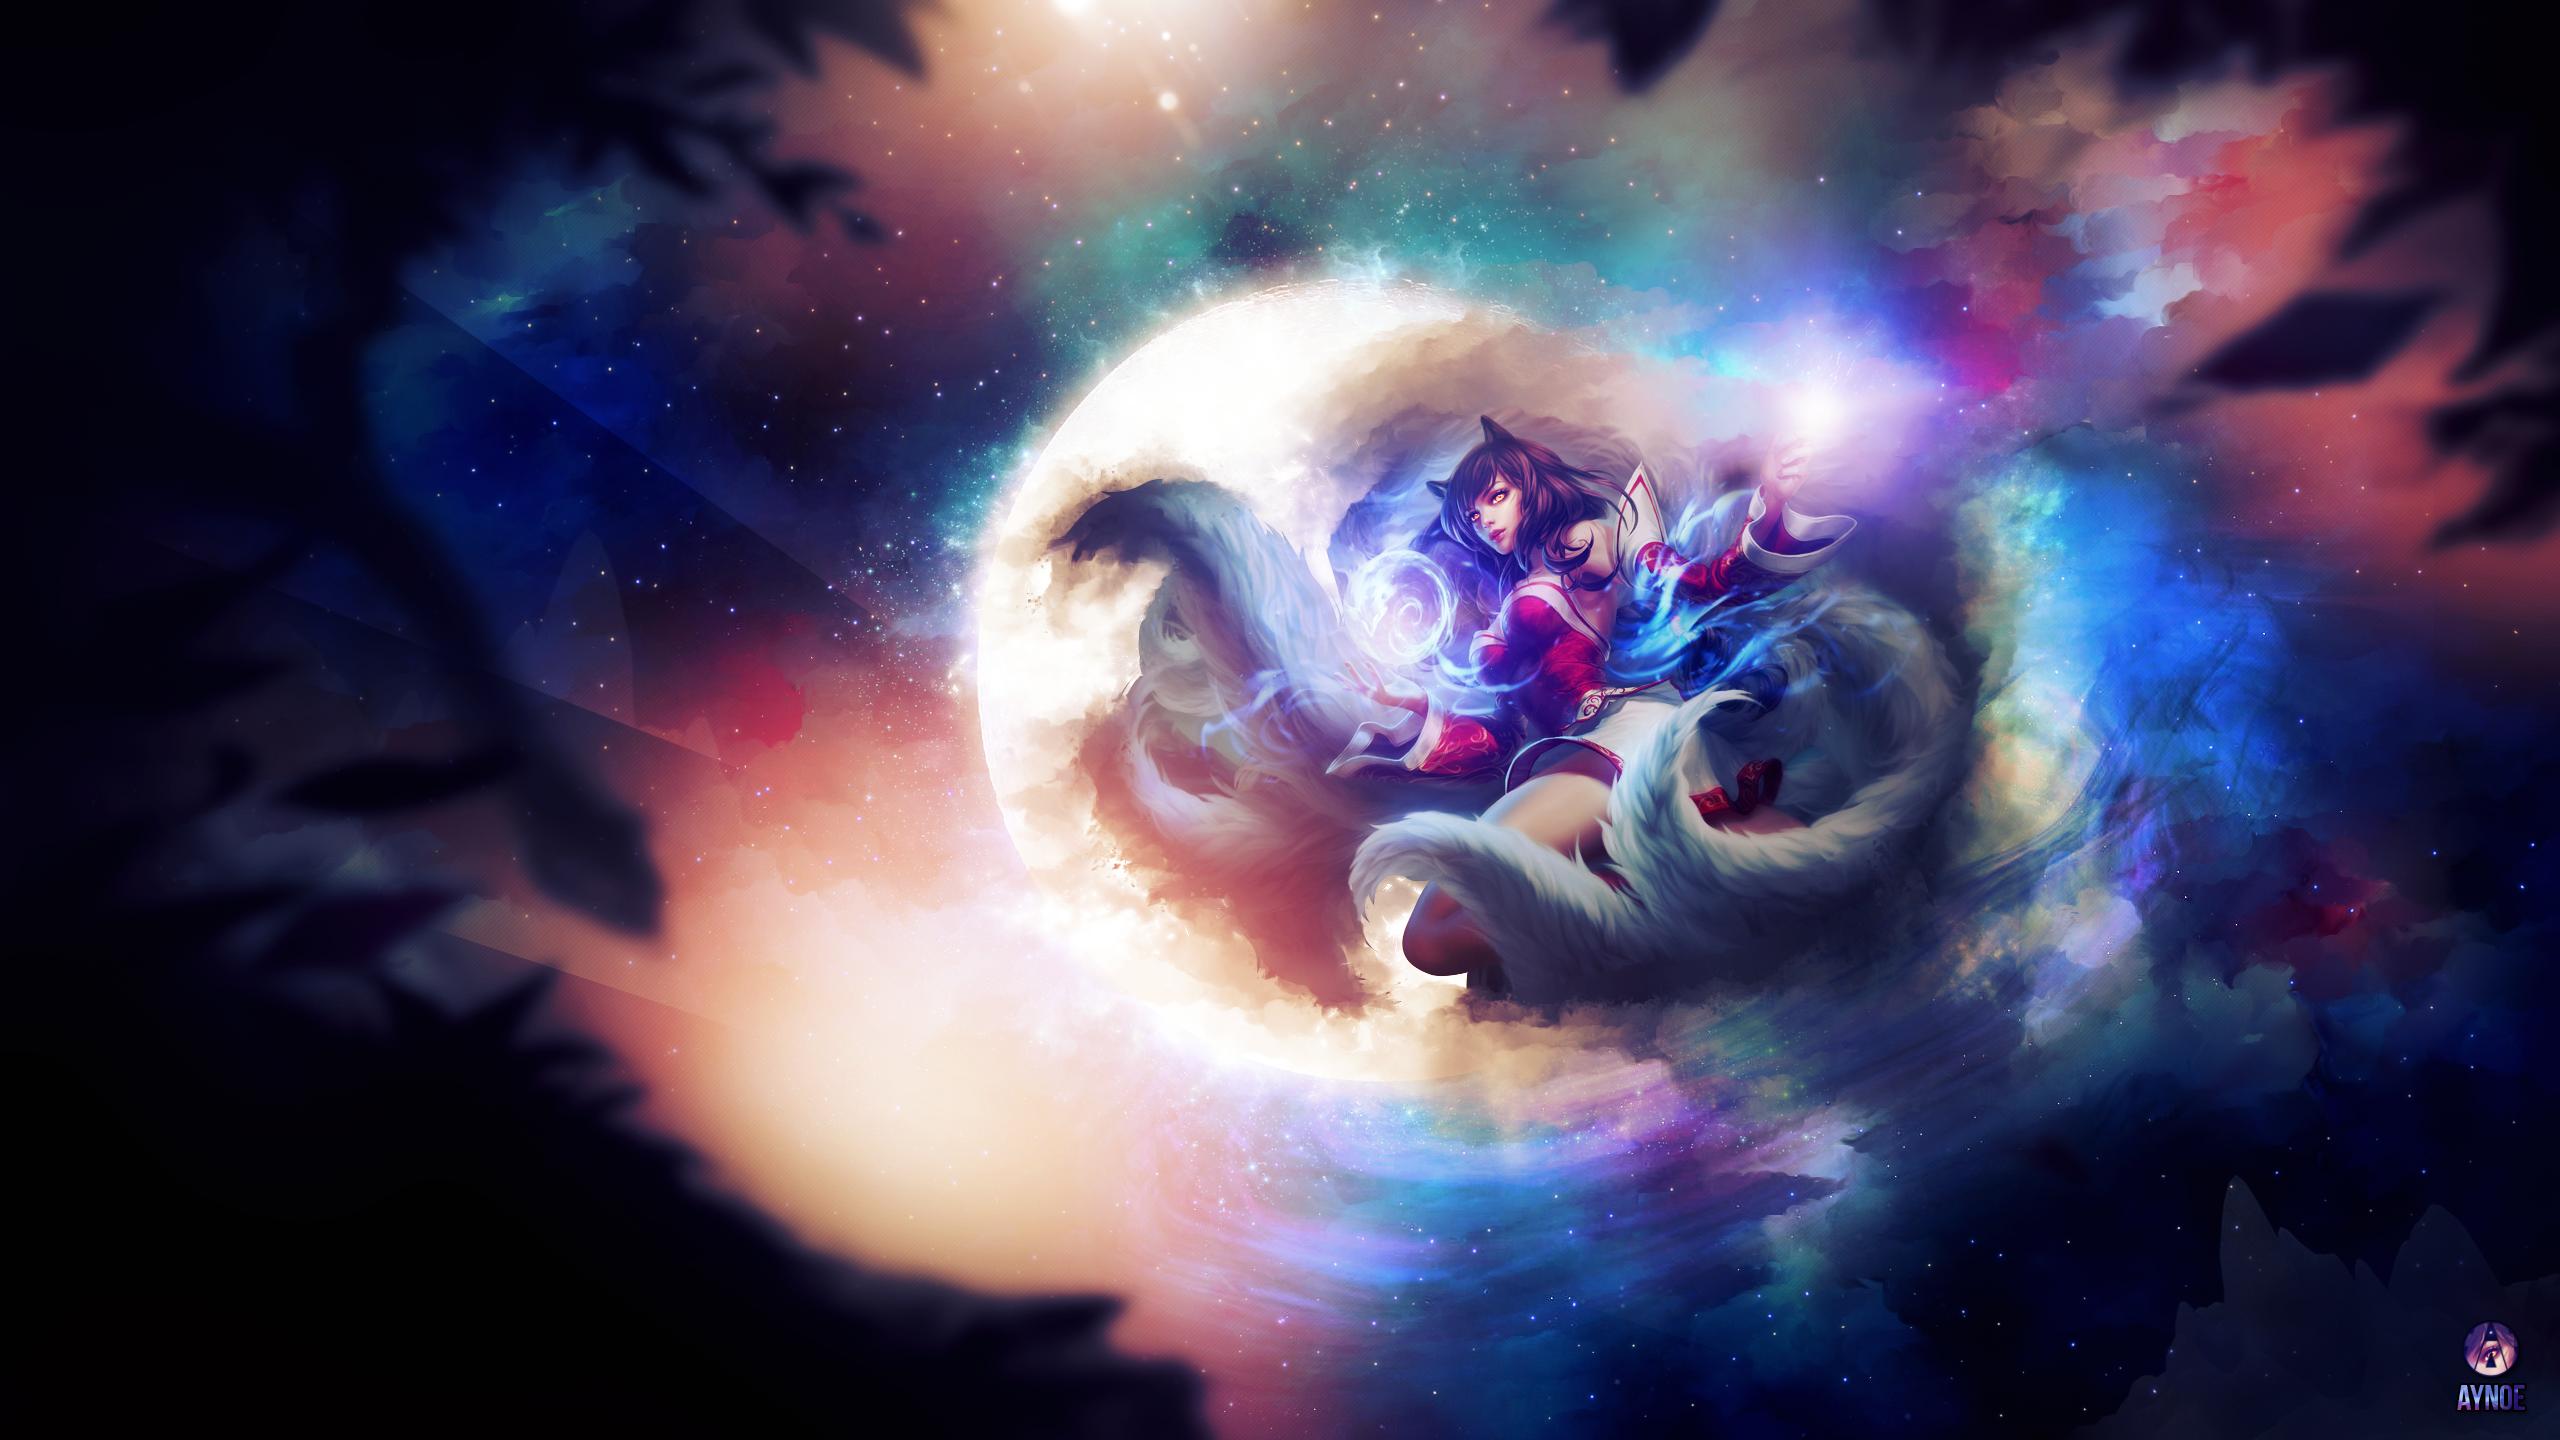 Ahri League Of Legends Wallpaper By Aynoe On Deviantart